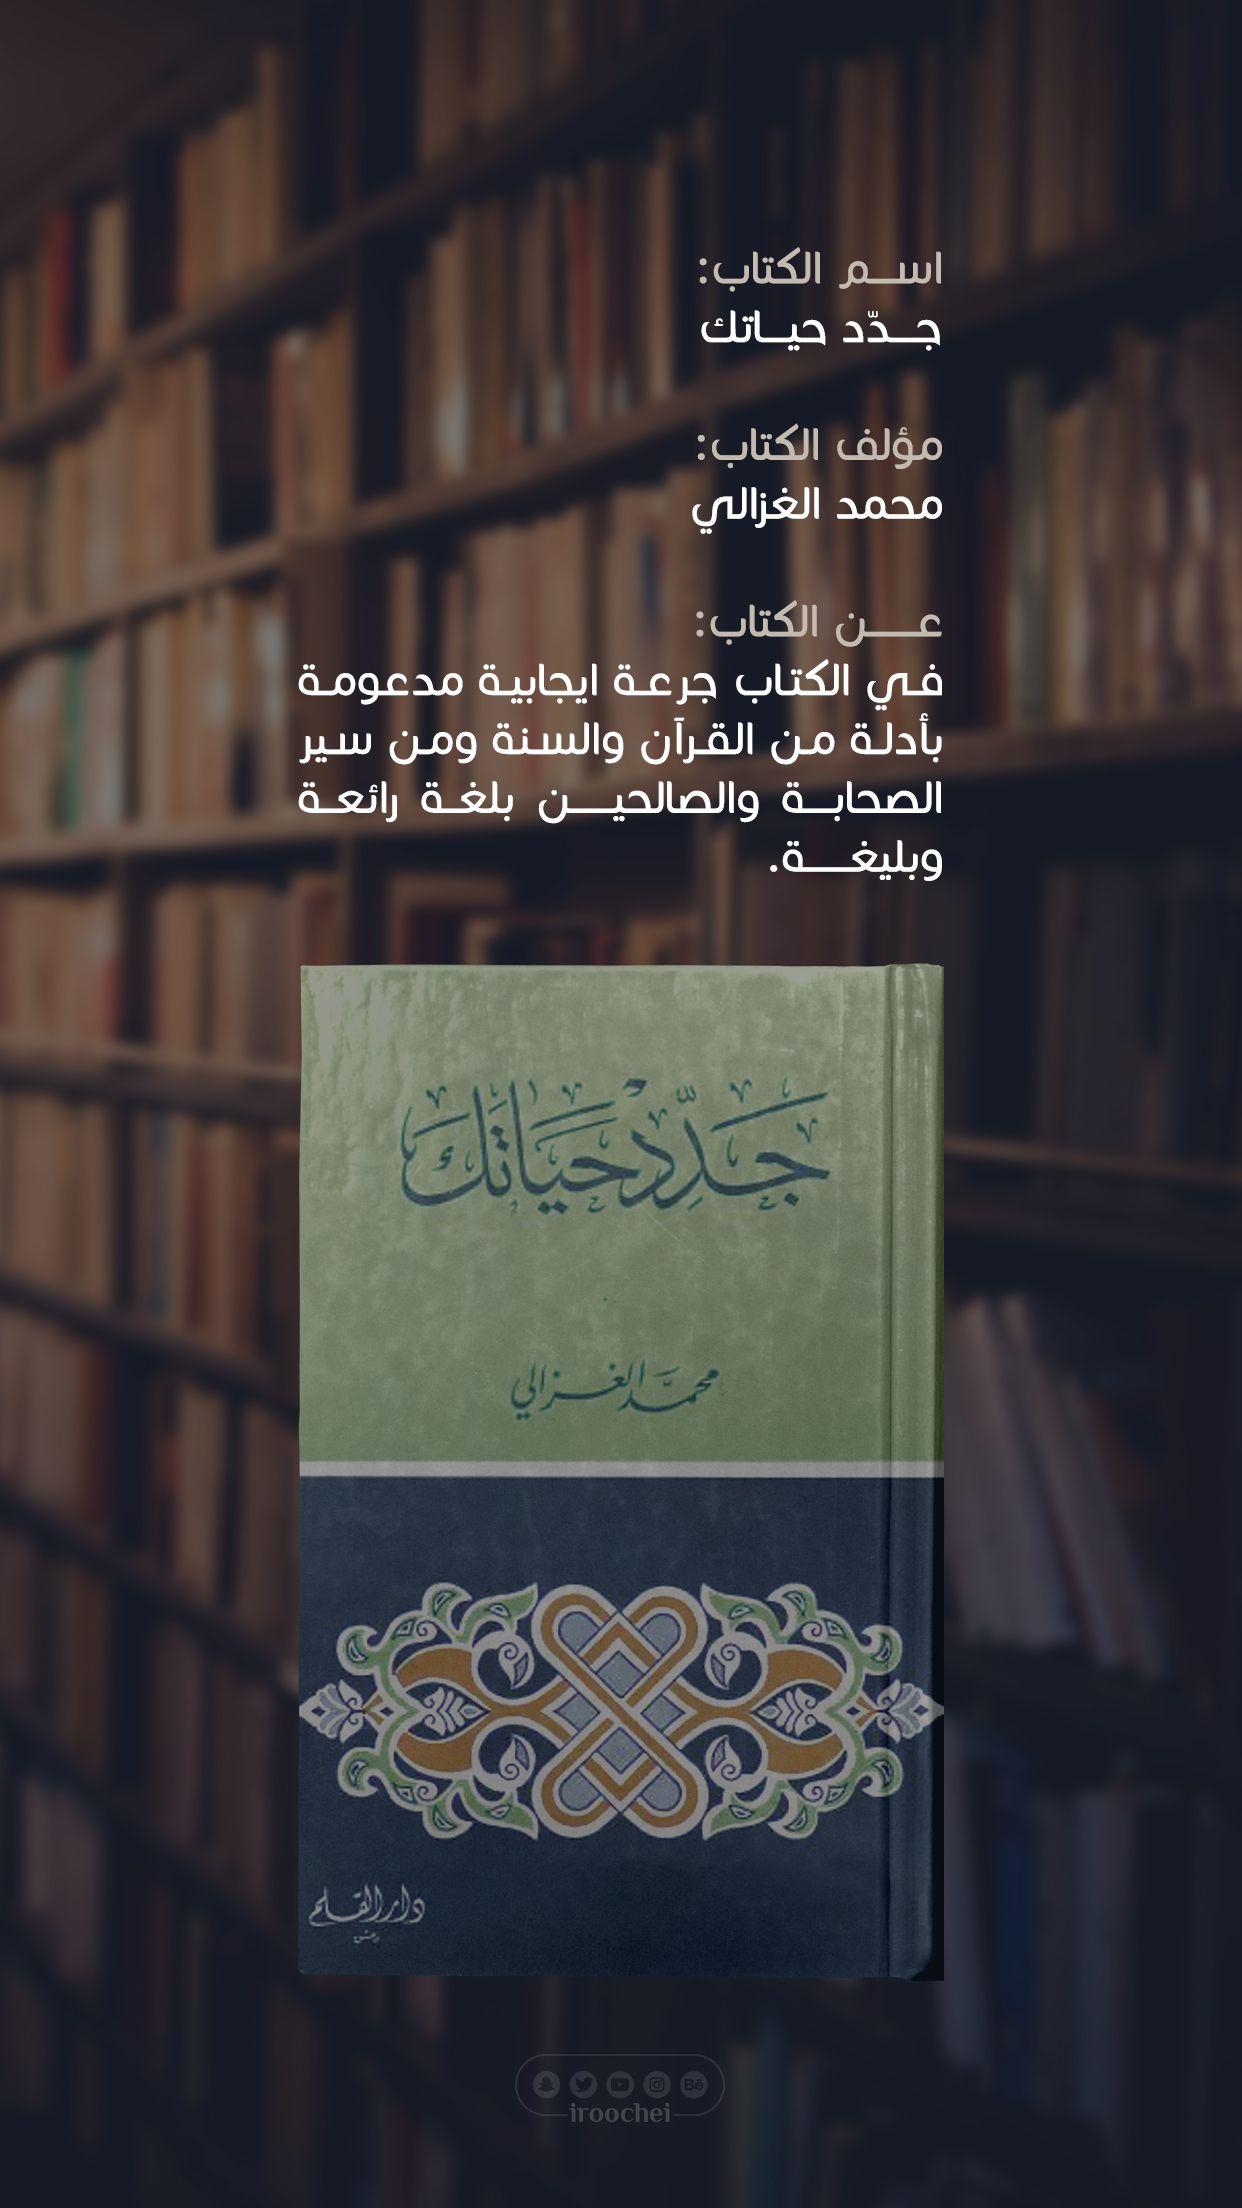 Pin By Ahmeđ Bou On مكتبة روشي Inspirational Books Book Qoutes Books